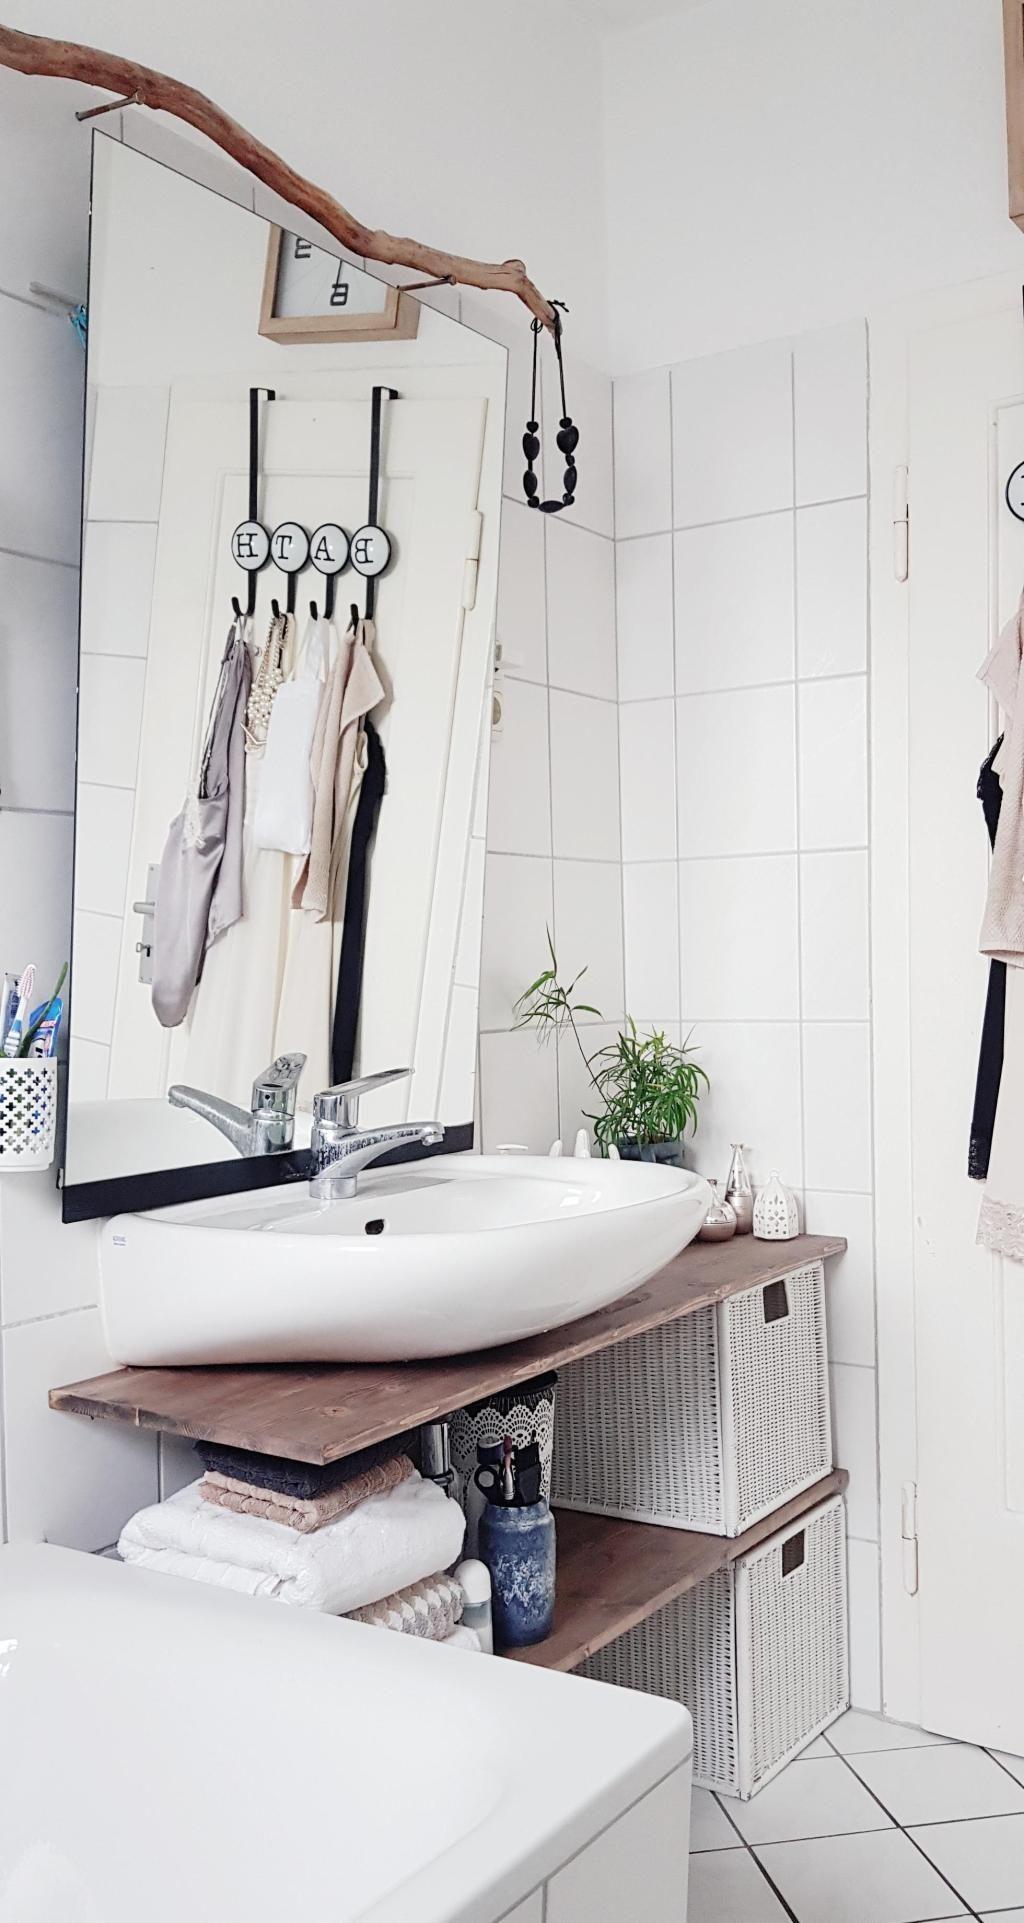 Badezimmer Seite 4 Bilder Ideen Couchstyle Badezimmer Badmobel Badezimmermobel Badmobel Set Spiegelschrank B In 2020 Trendy Bathroom Bathroom Tile Diy Diy Bathroom